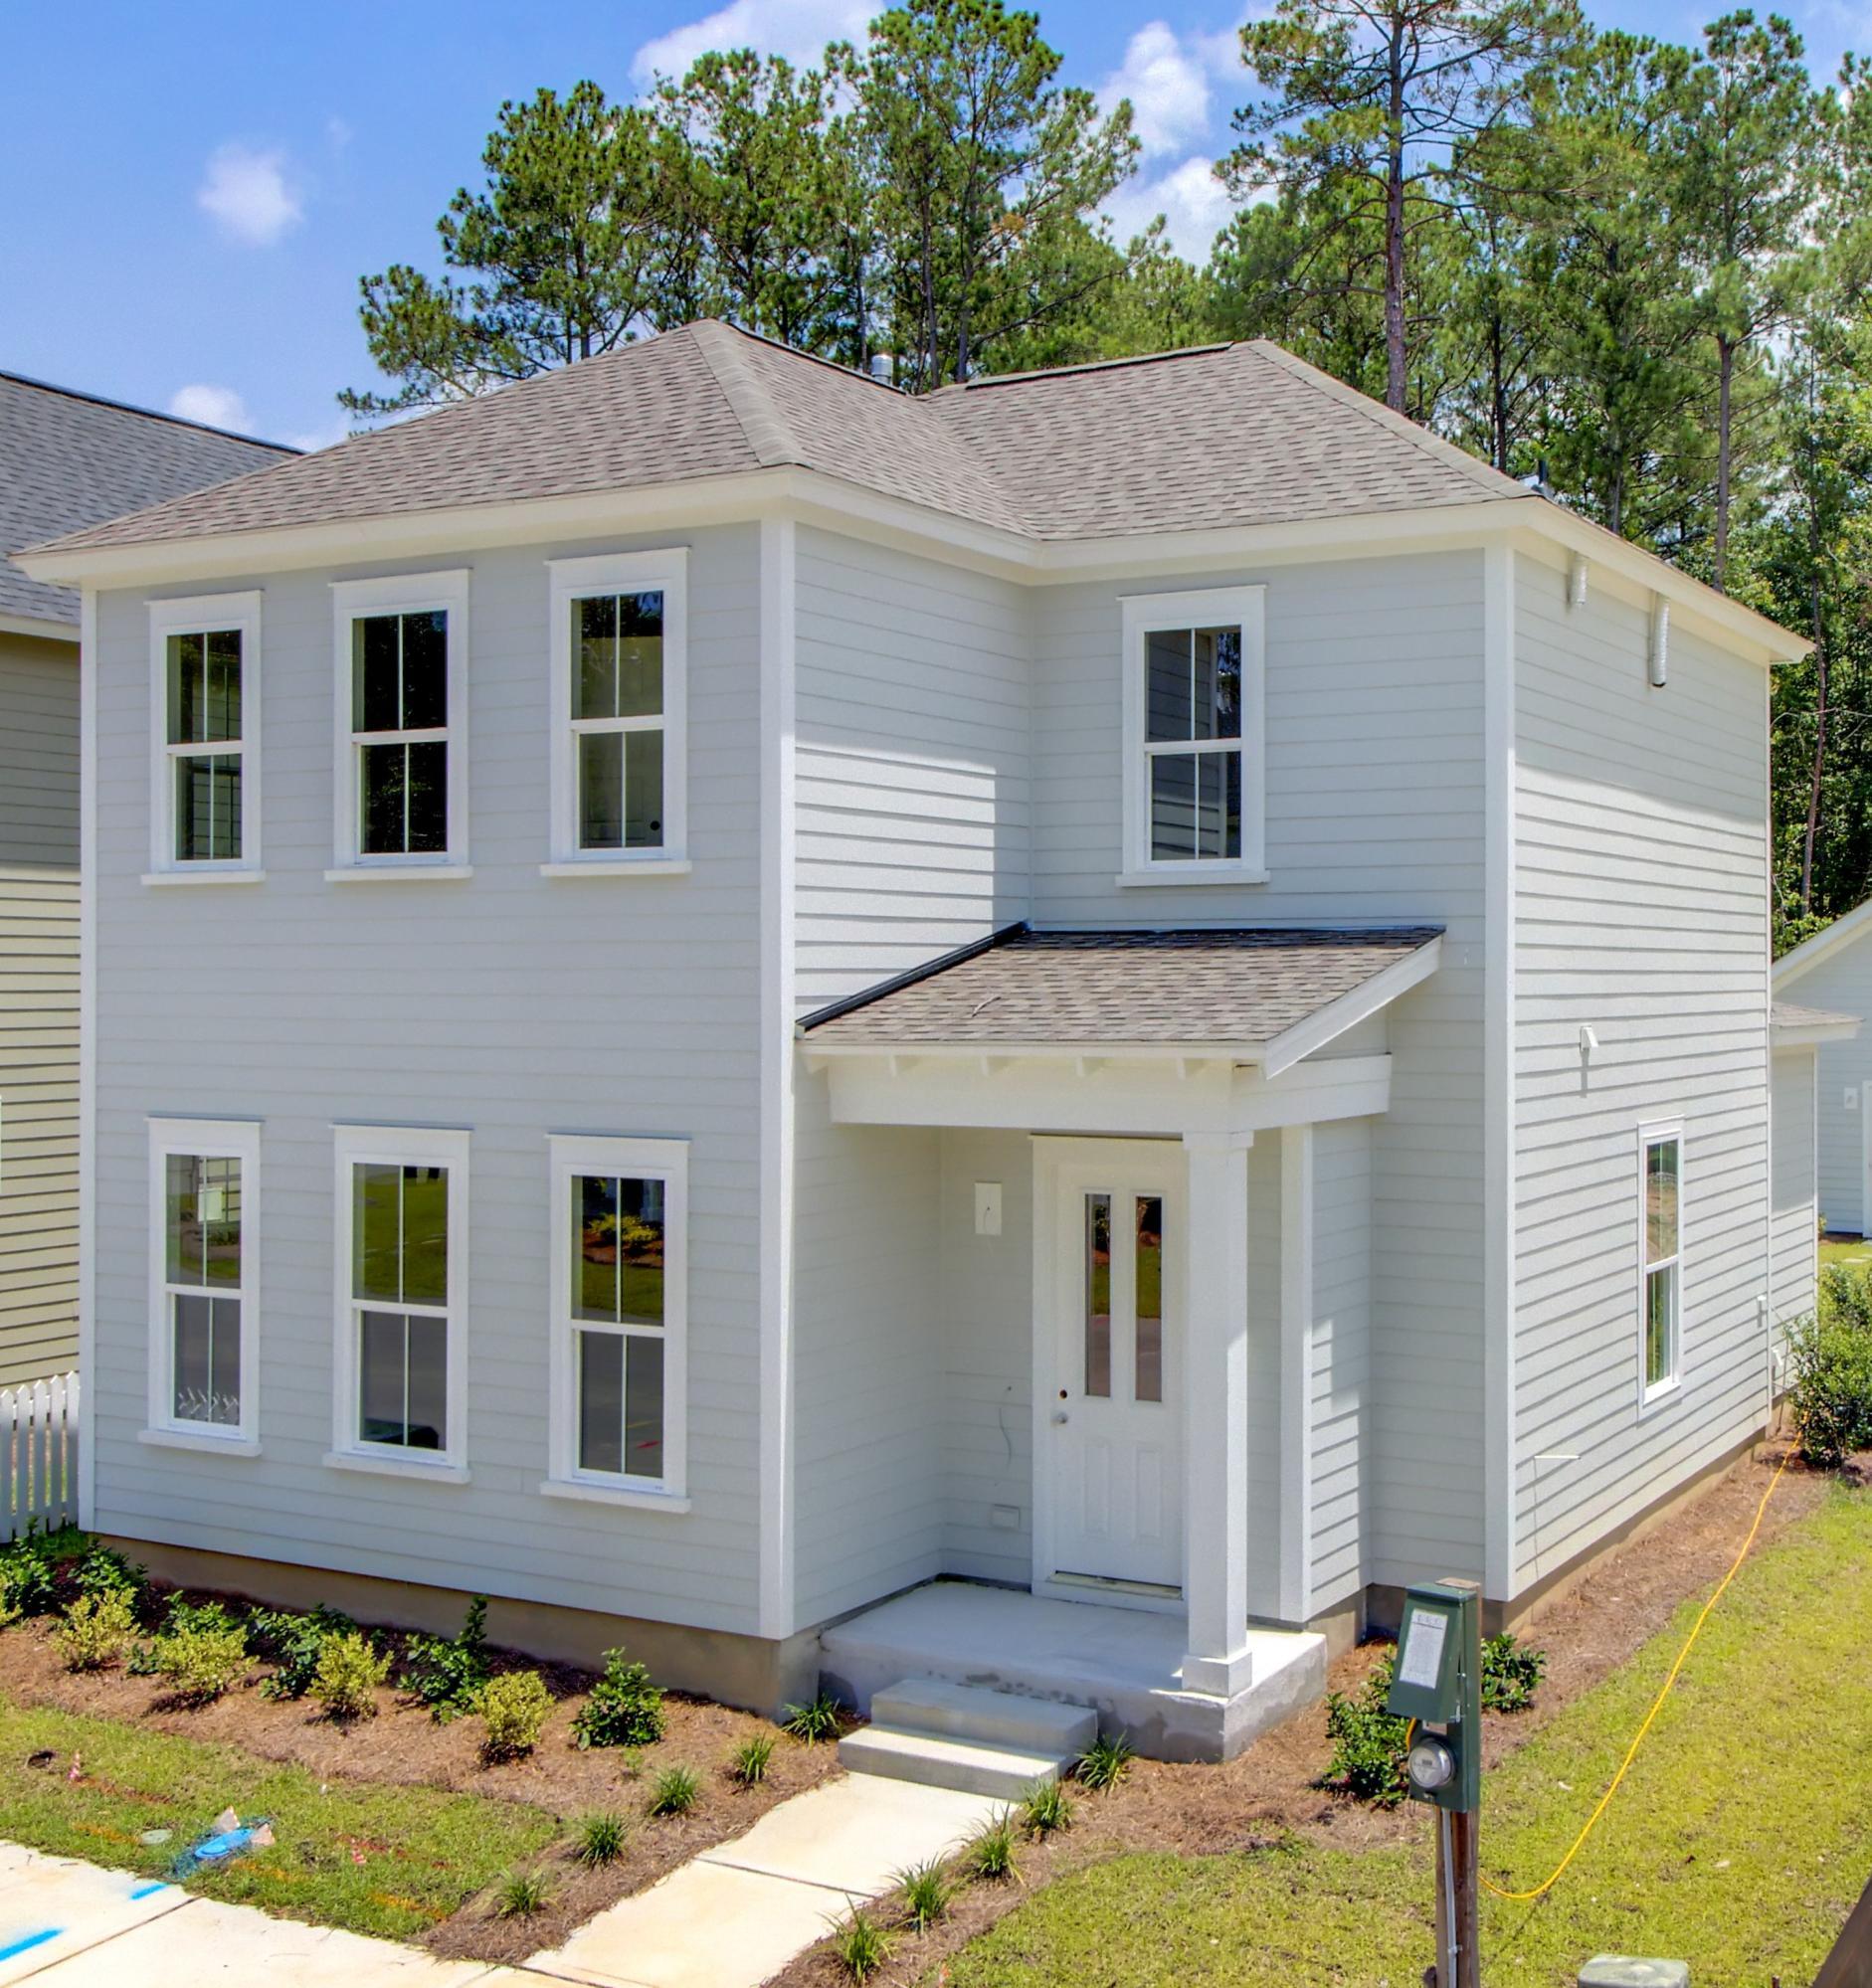 Fulton Park Homes For Sale - 1206 Max, Mount Pleasant, SC - 27